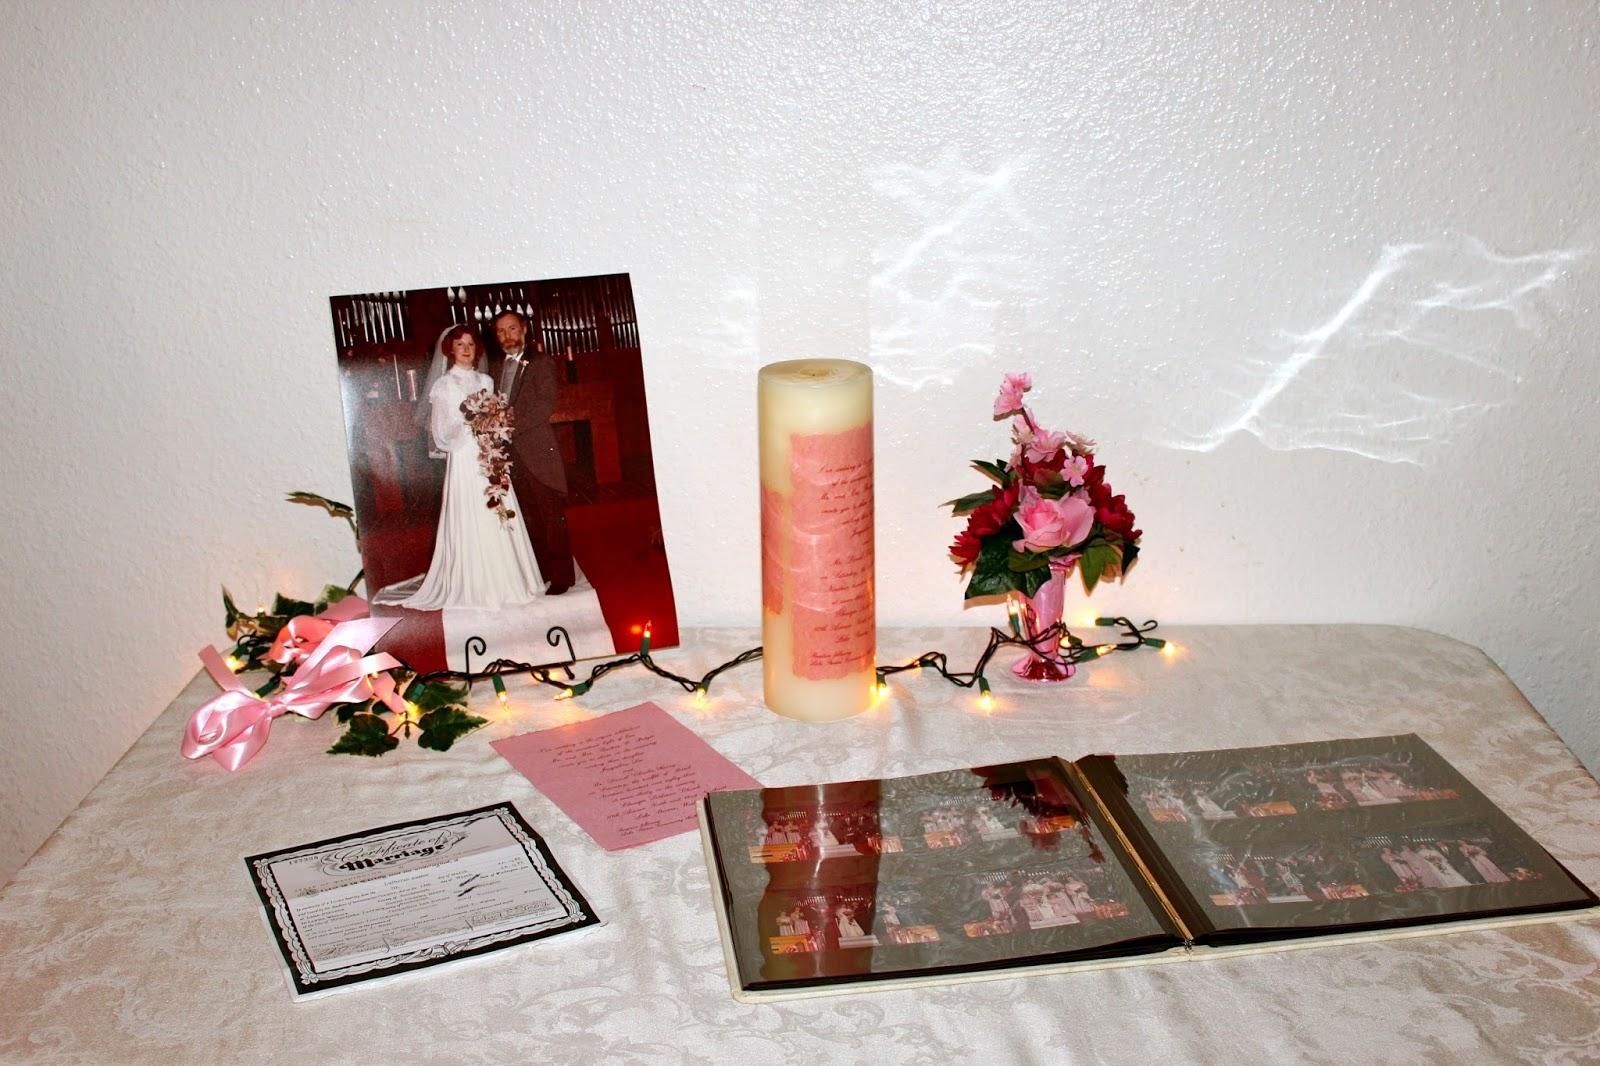 Wedding Anniversary Gifts: 30th Wedding Anniversary Ideas